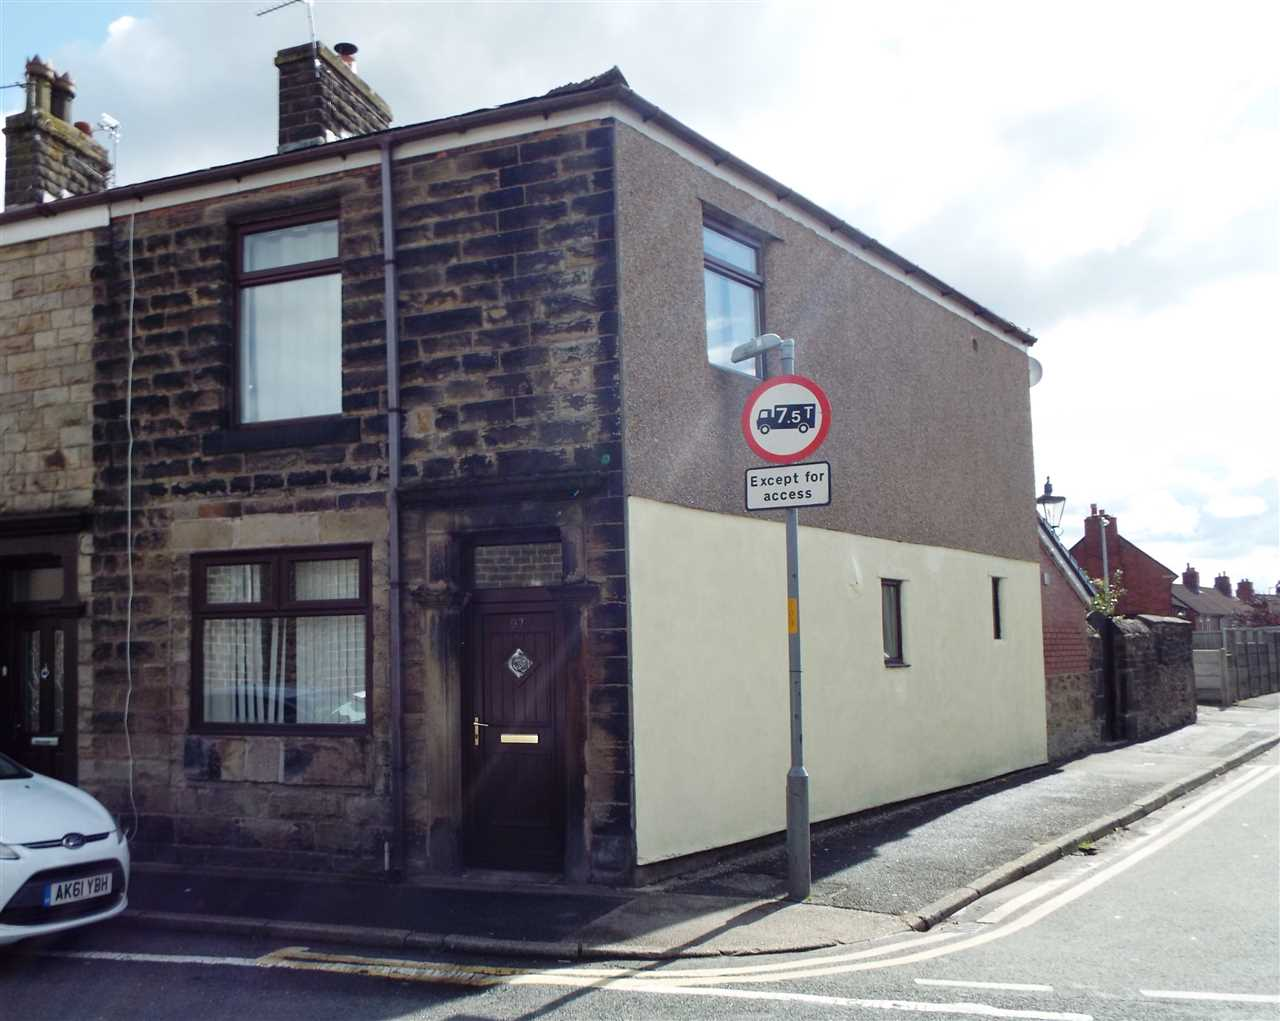 3 bed end-of-terrace for sale in Park Road, Adlington, Adlington - Property Image 1